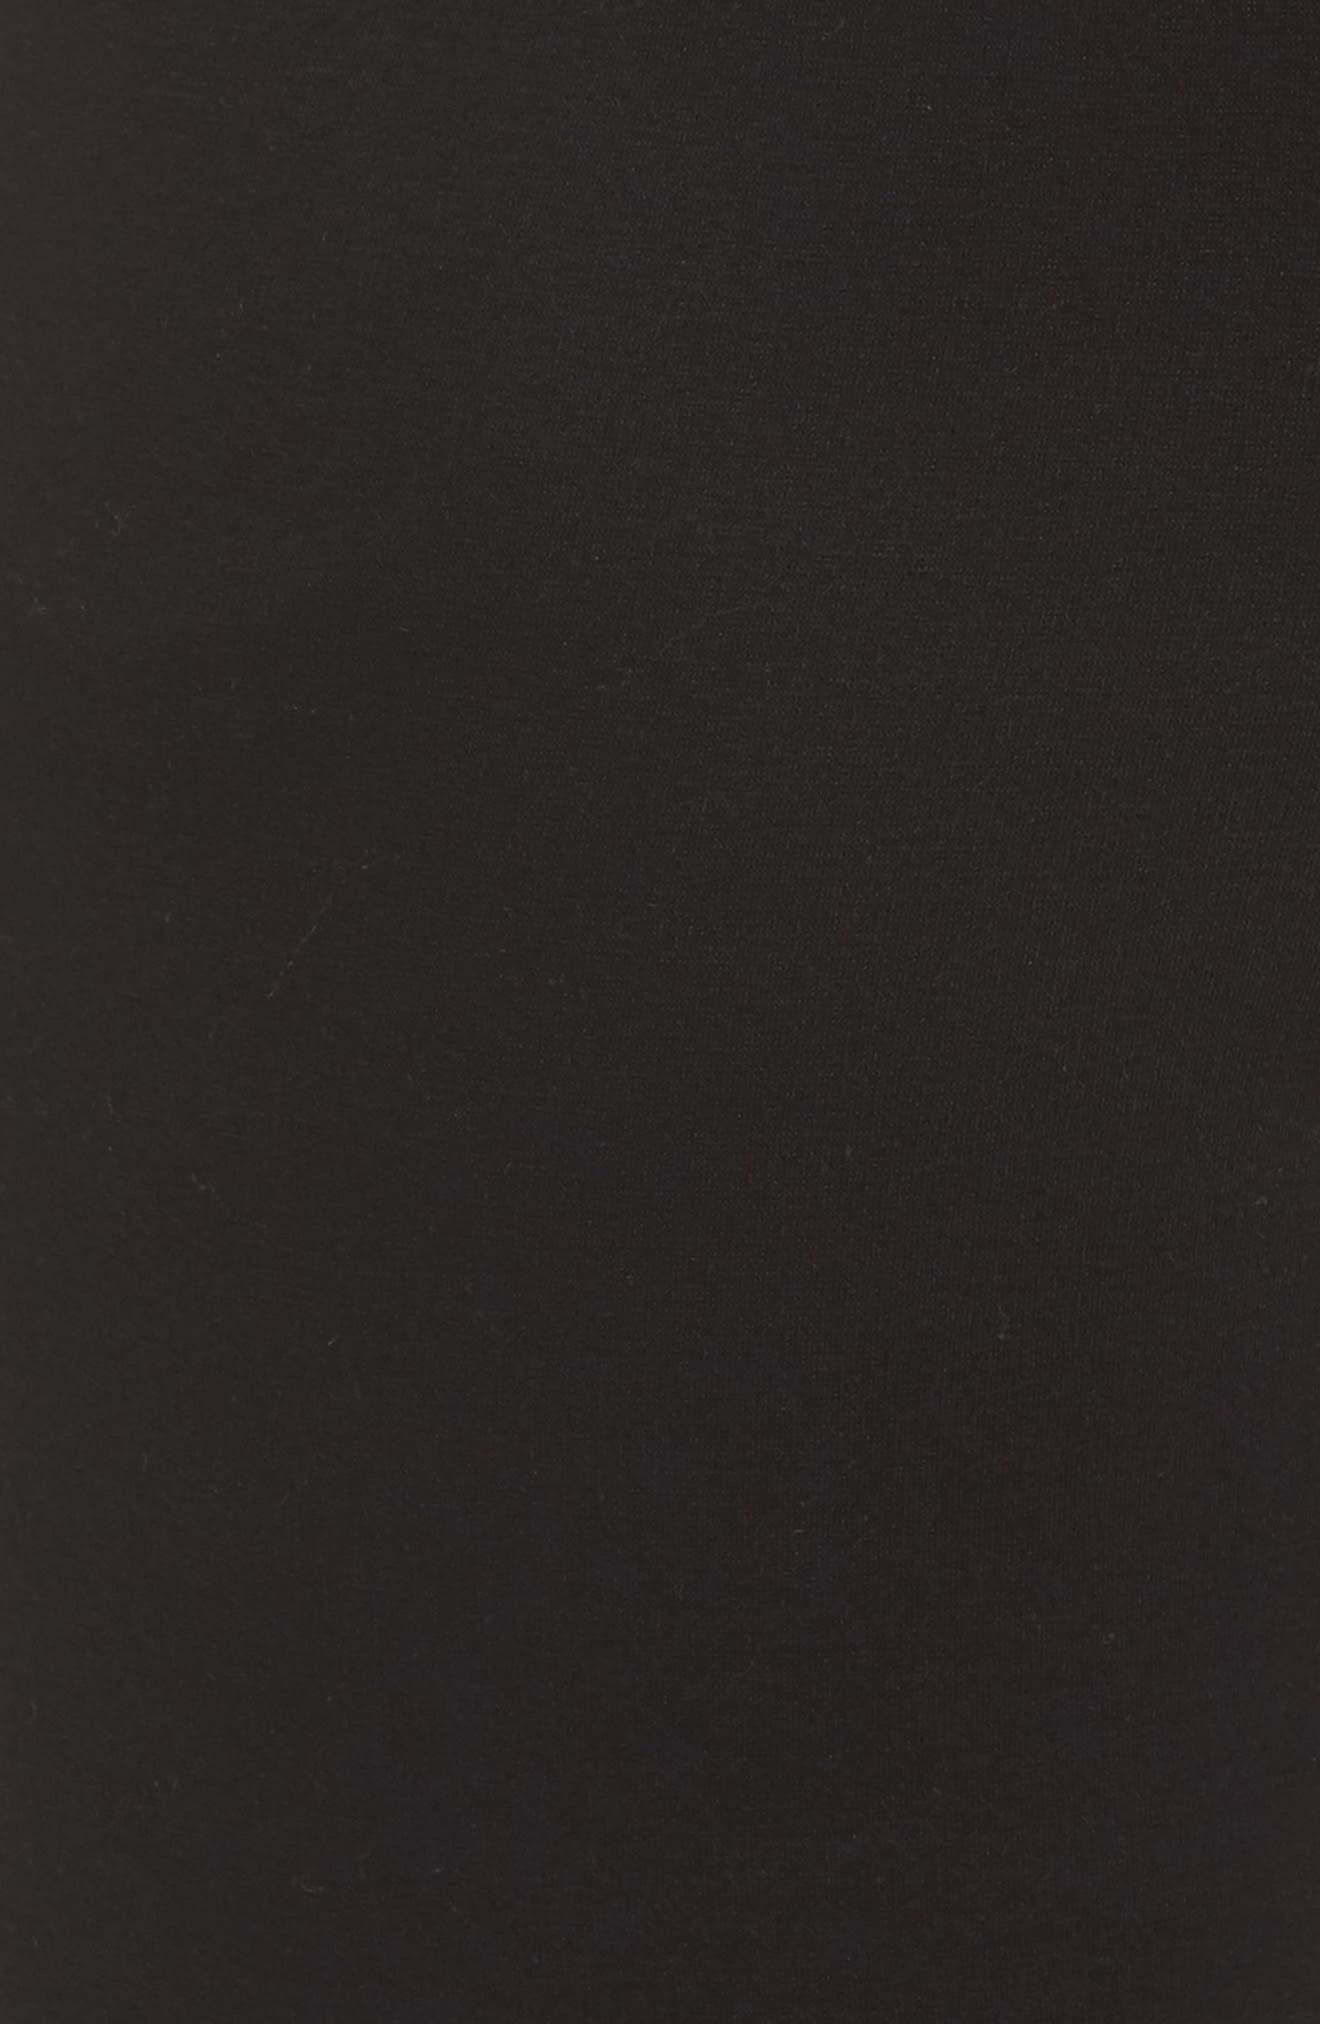 Penny Fleece Sweatpants,                             Alternate thumbnail 5, color,                             BLACK